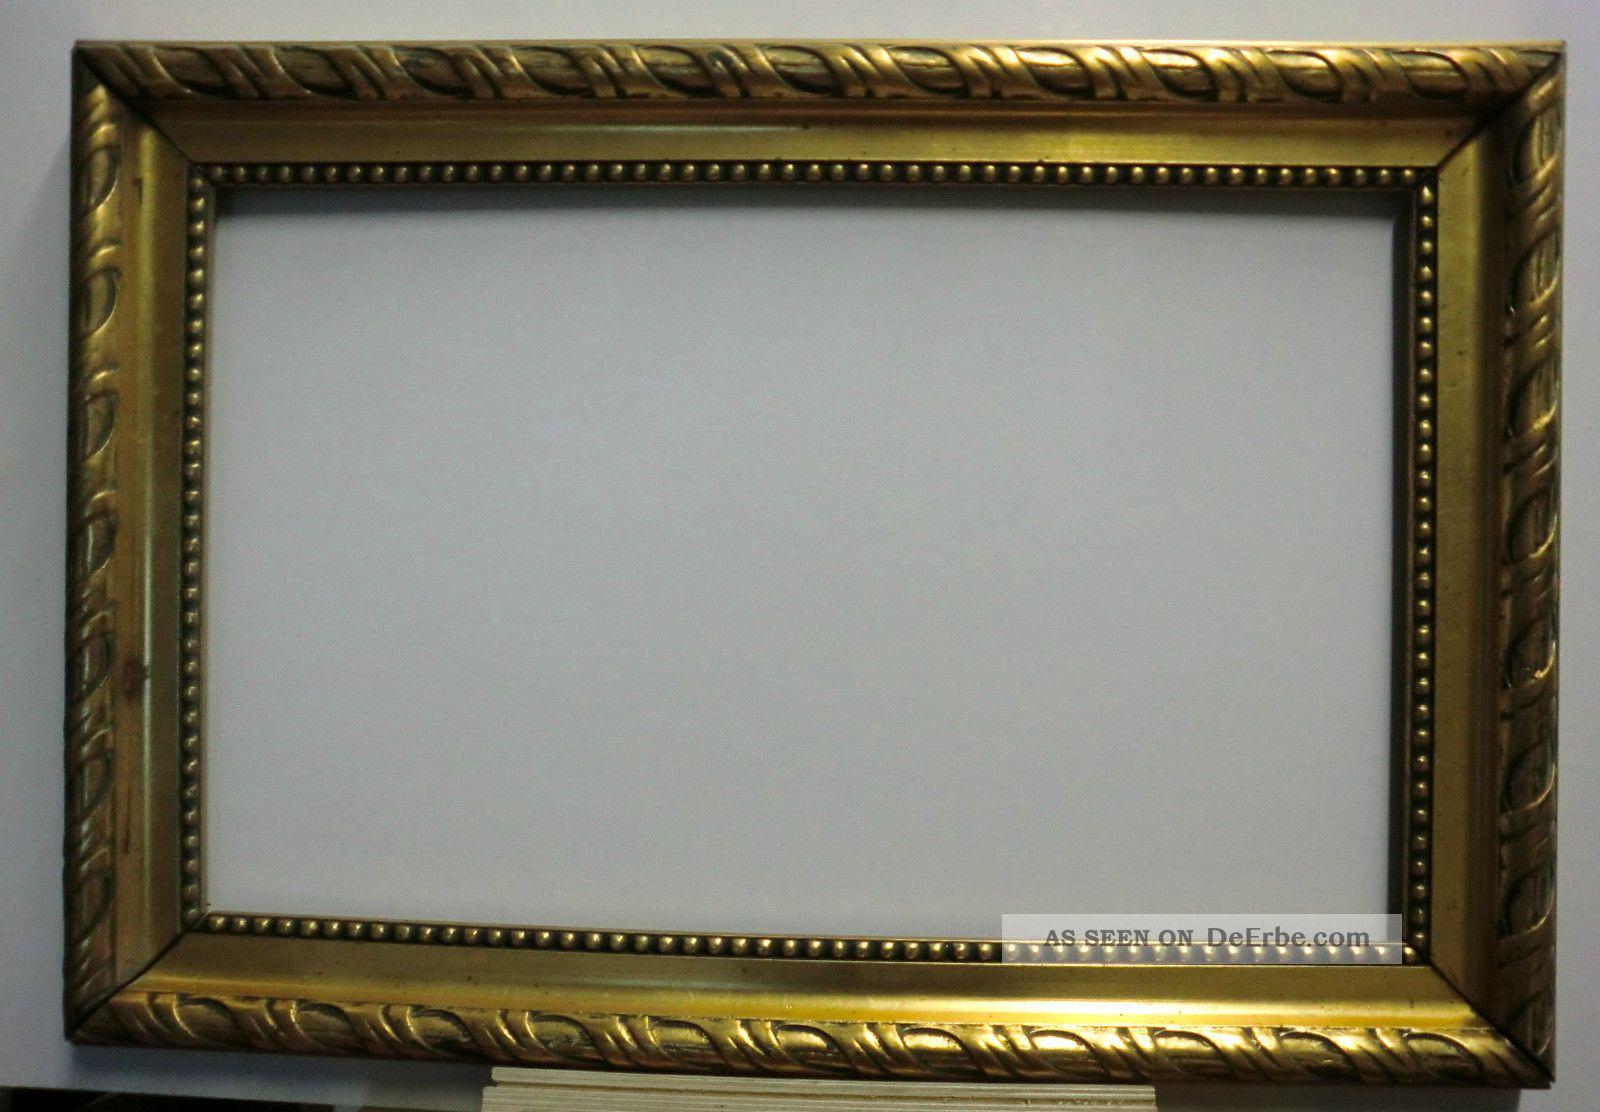 Bilderrahmen, Gemälderahmen Antik, Groß, Gold, Sehenswert